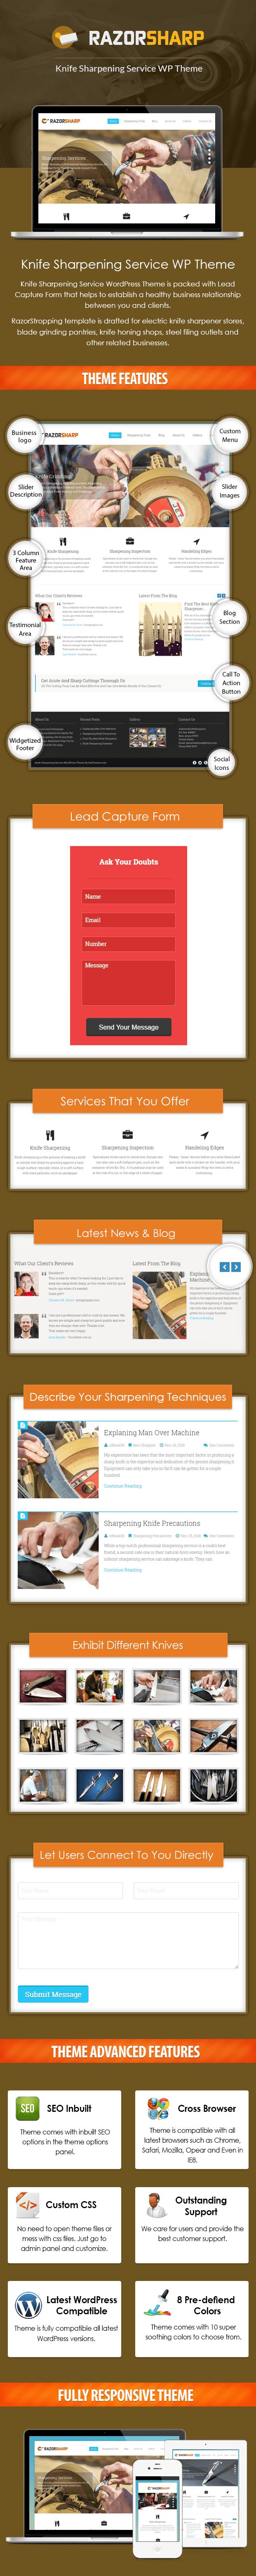 RazorSharp WP Theme Sales Page